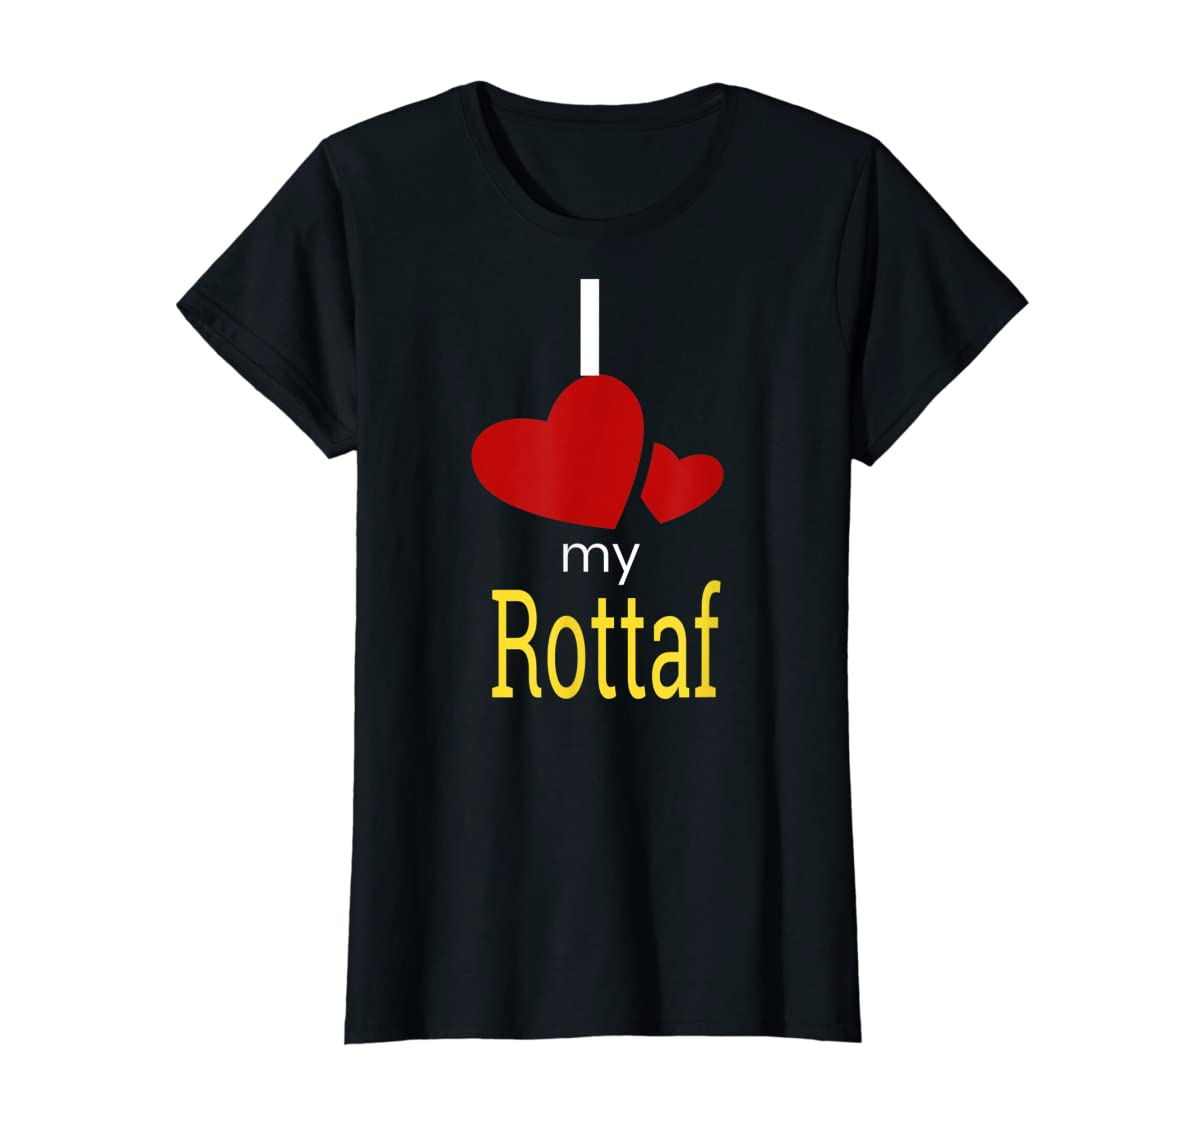 Rottaf Dog Shirt Love Rottweiler + Afghan Hound =  T-Shirt-Women's T-Shirt-Black